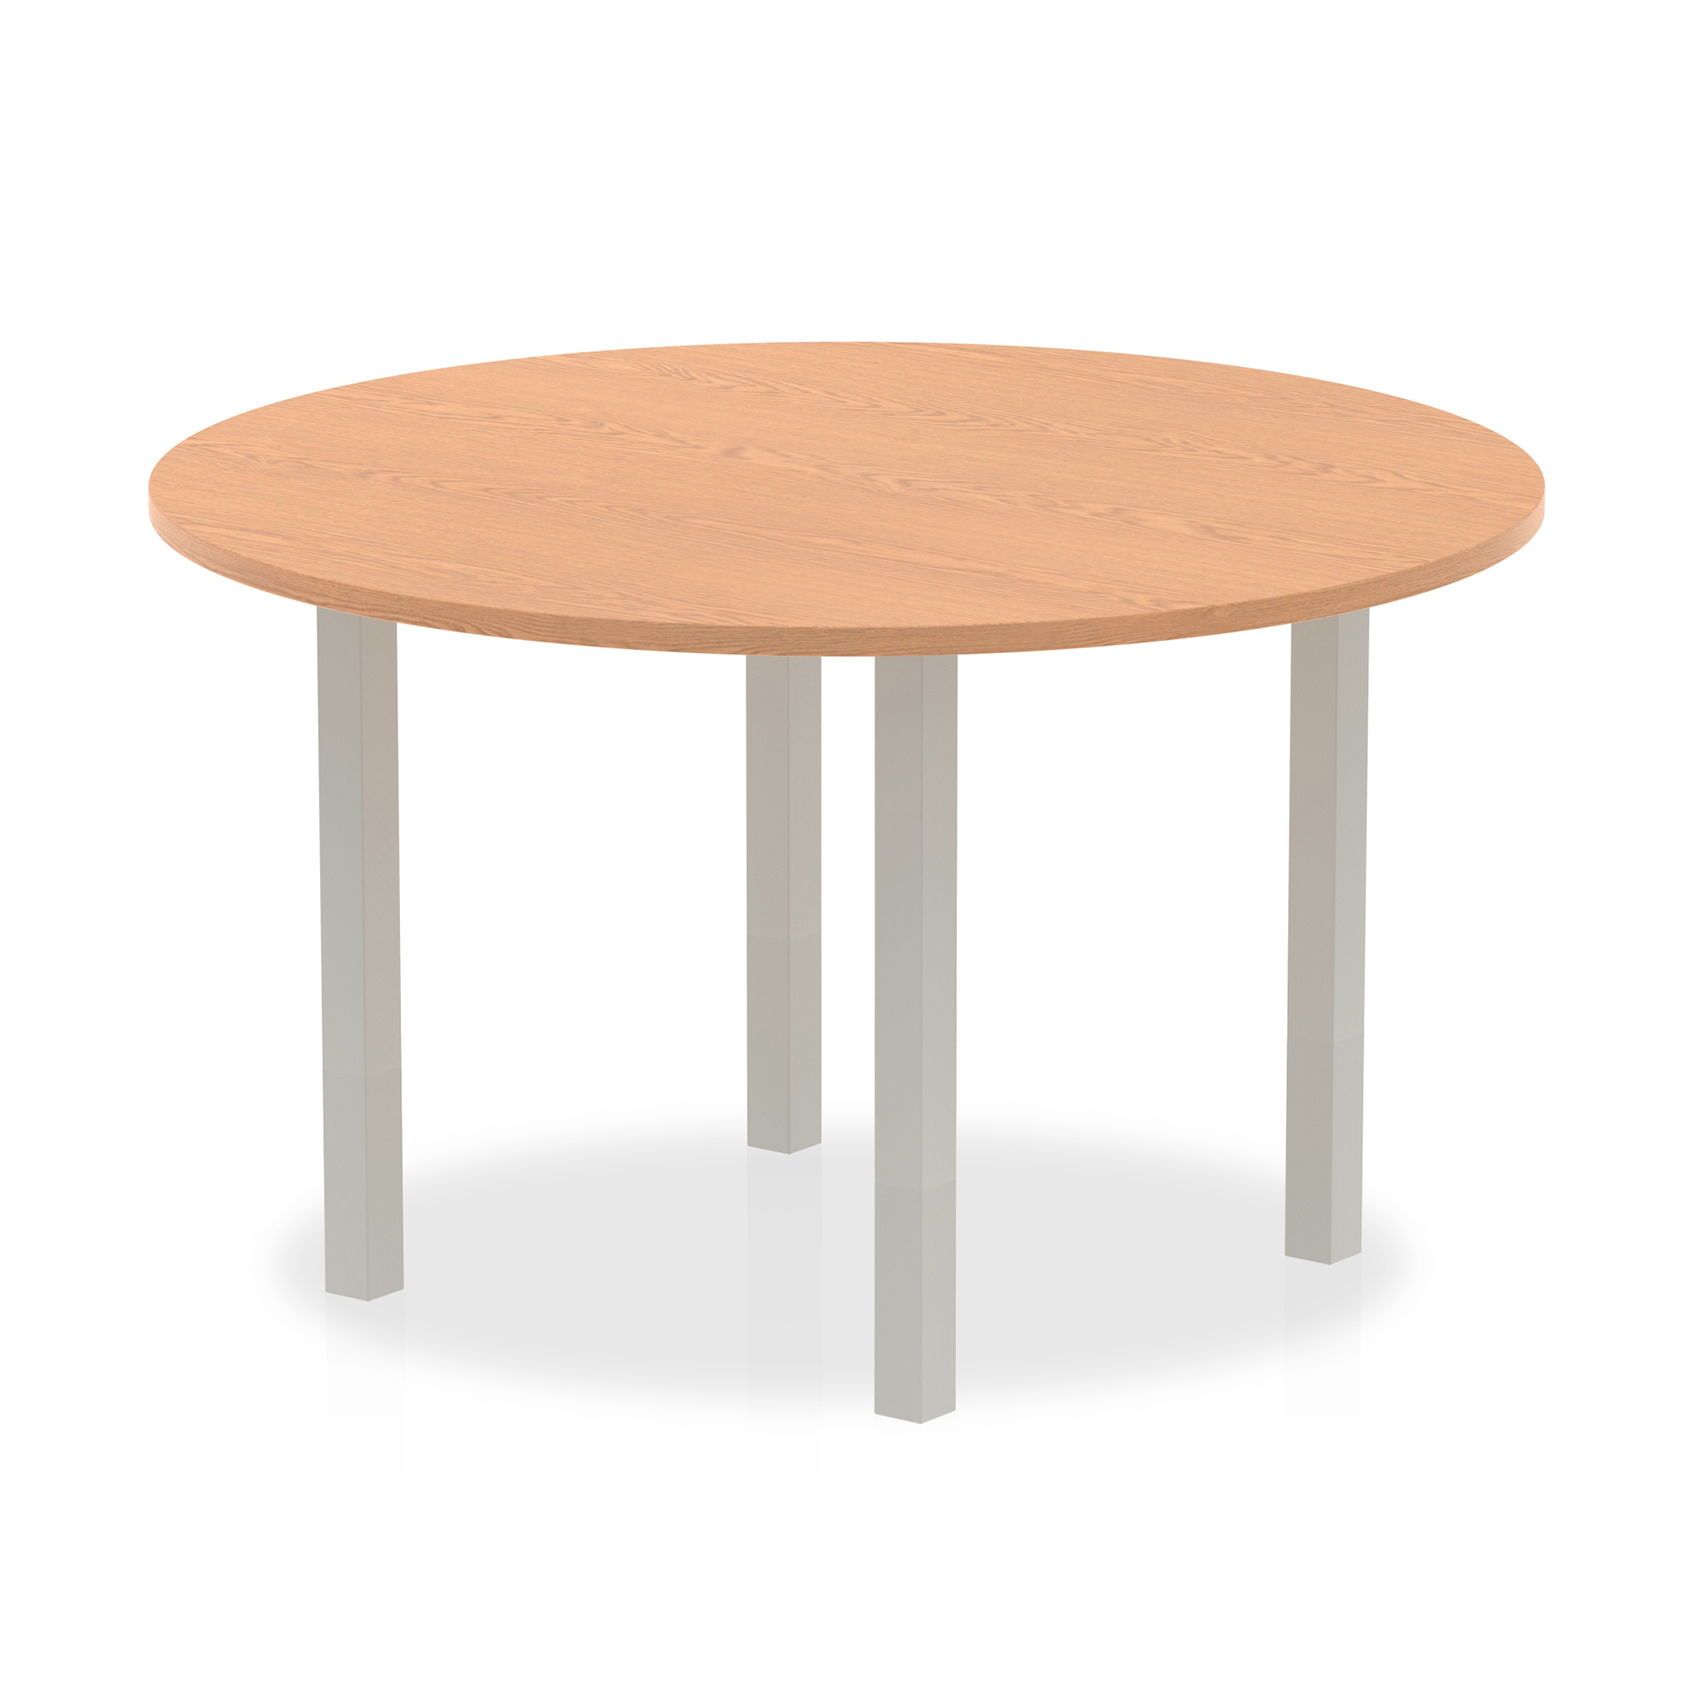 Trexus Meeting Table Round 1200mmOak Ref I000788